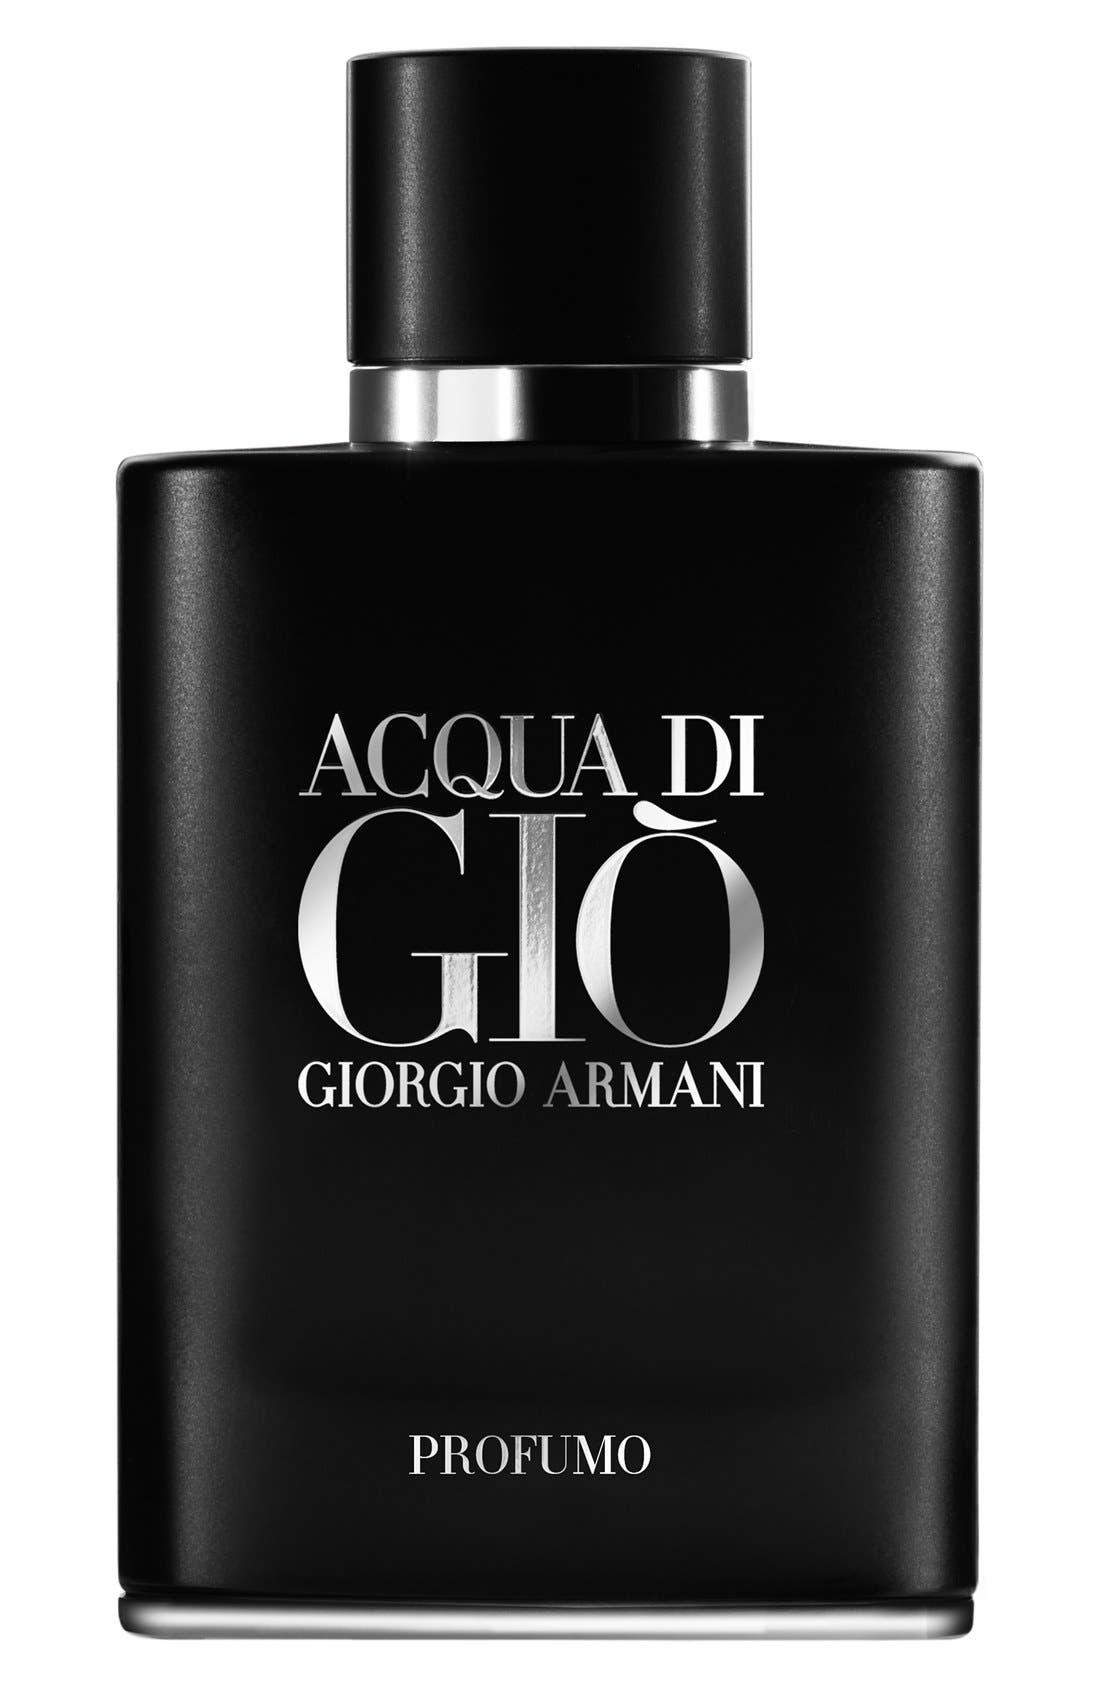 armani fragrance